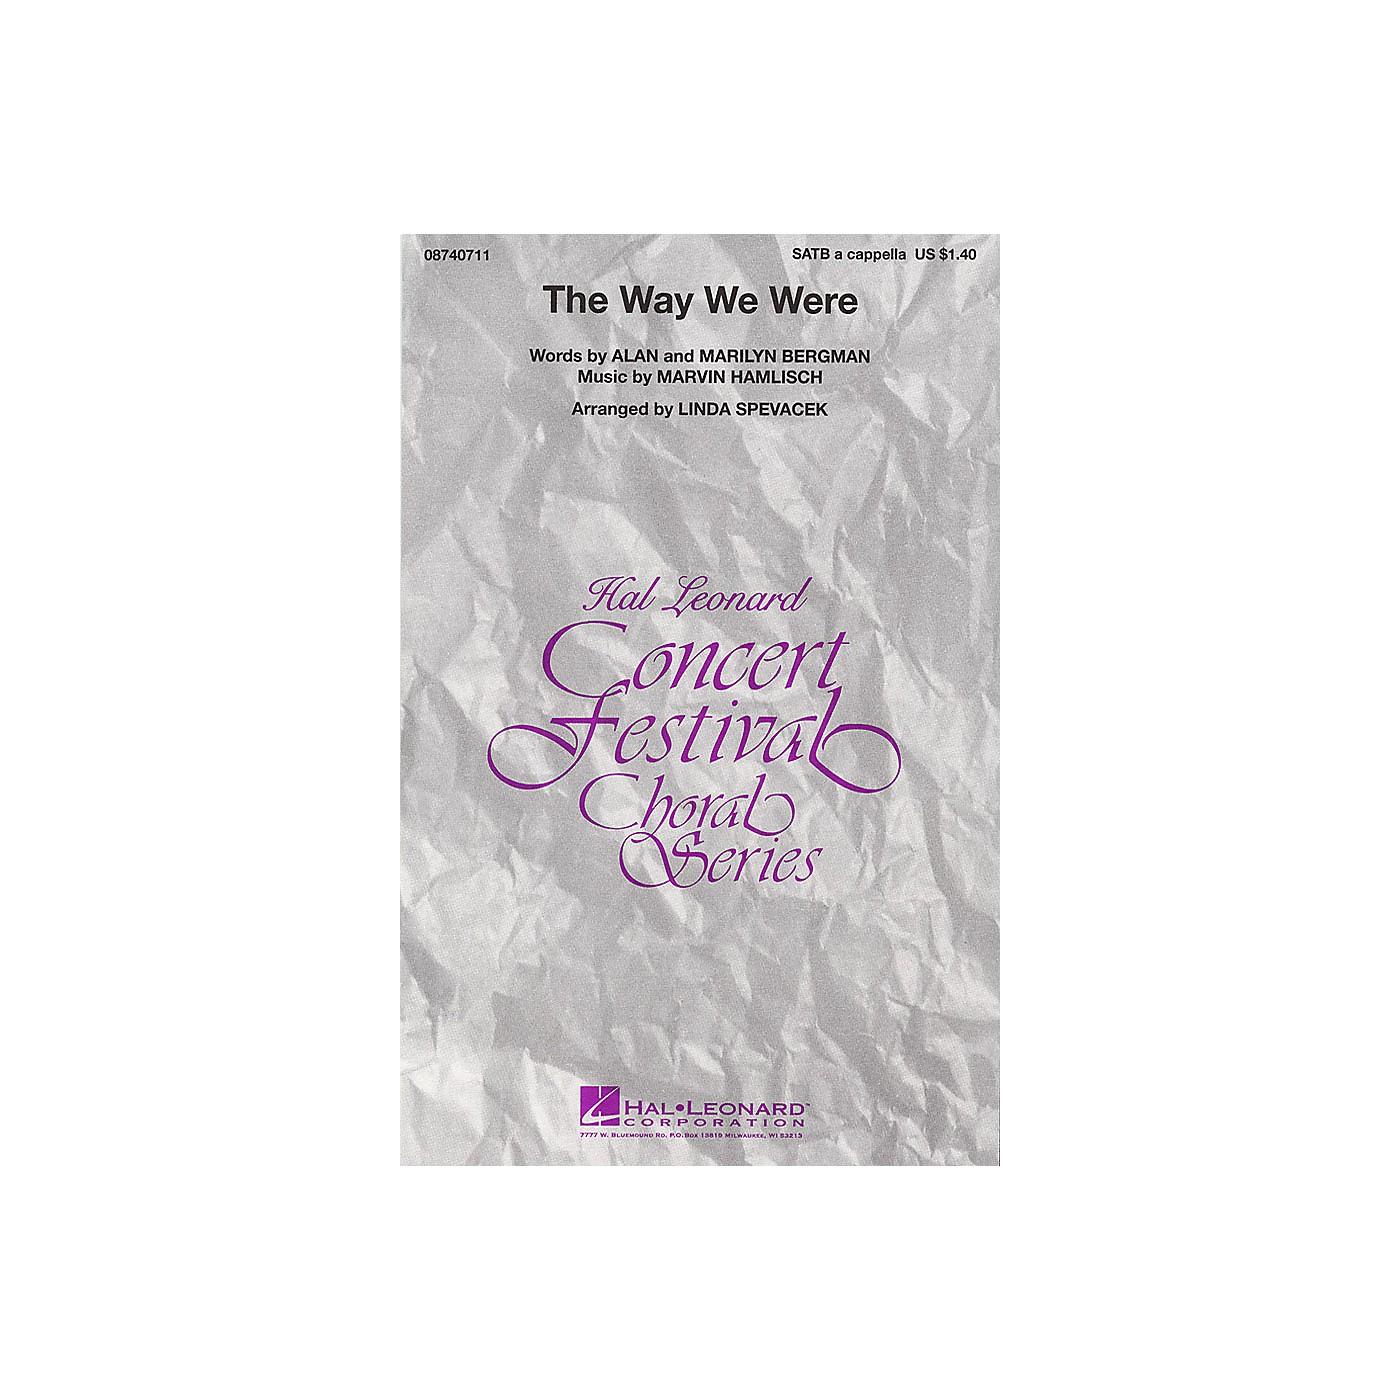 Hal Leonard The Way We Were SATB a cappella by Barbra Streisand arranged by Linda Spevacek thumbnail